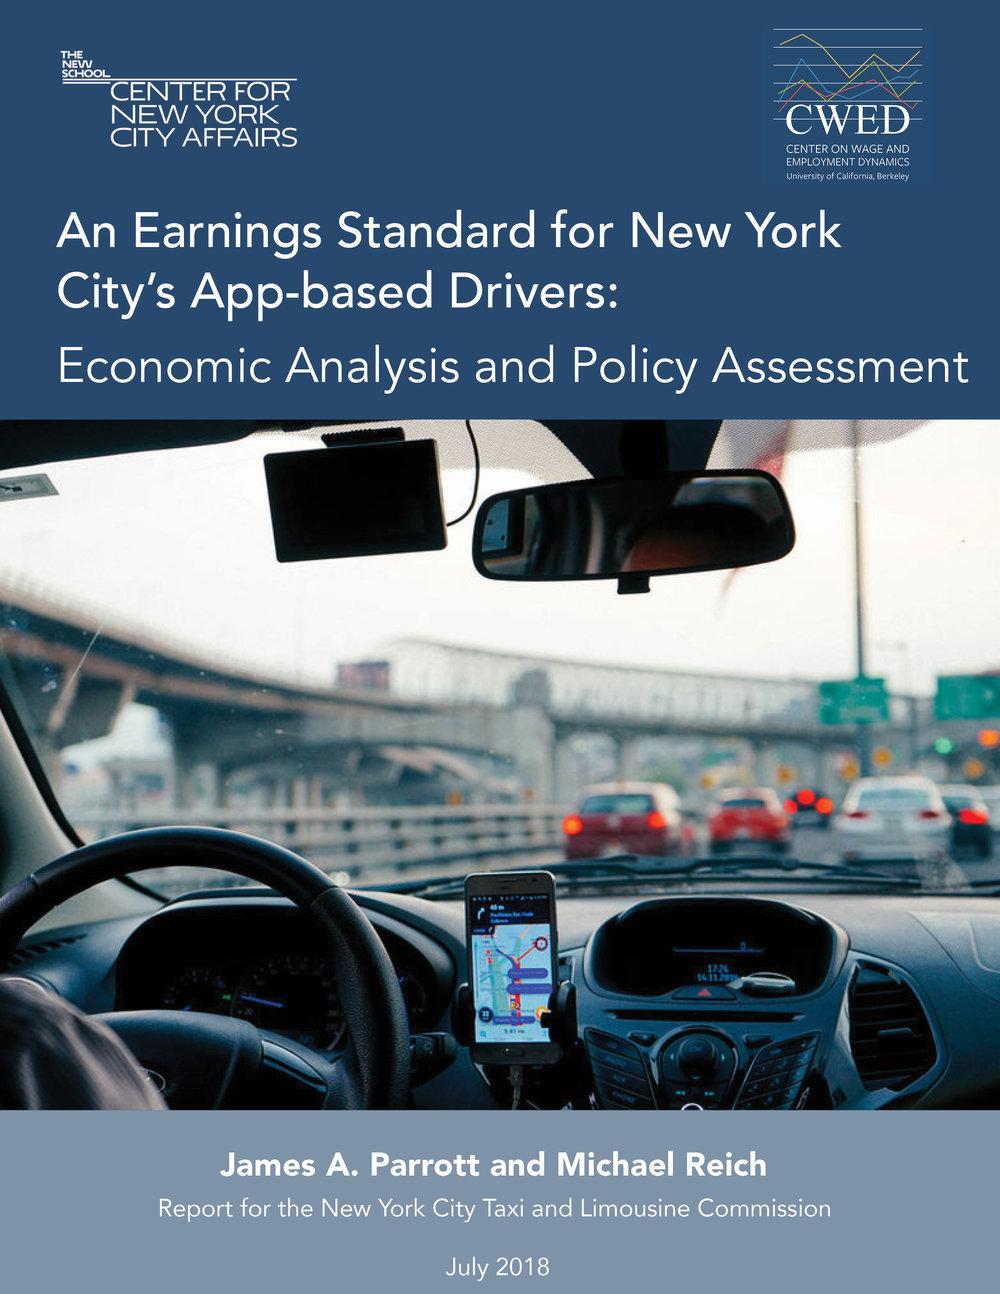 An Earnings Standard for New York City's App-based Drivers